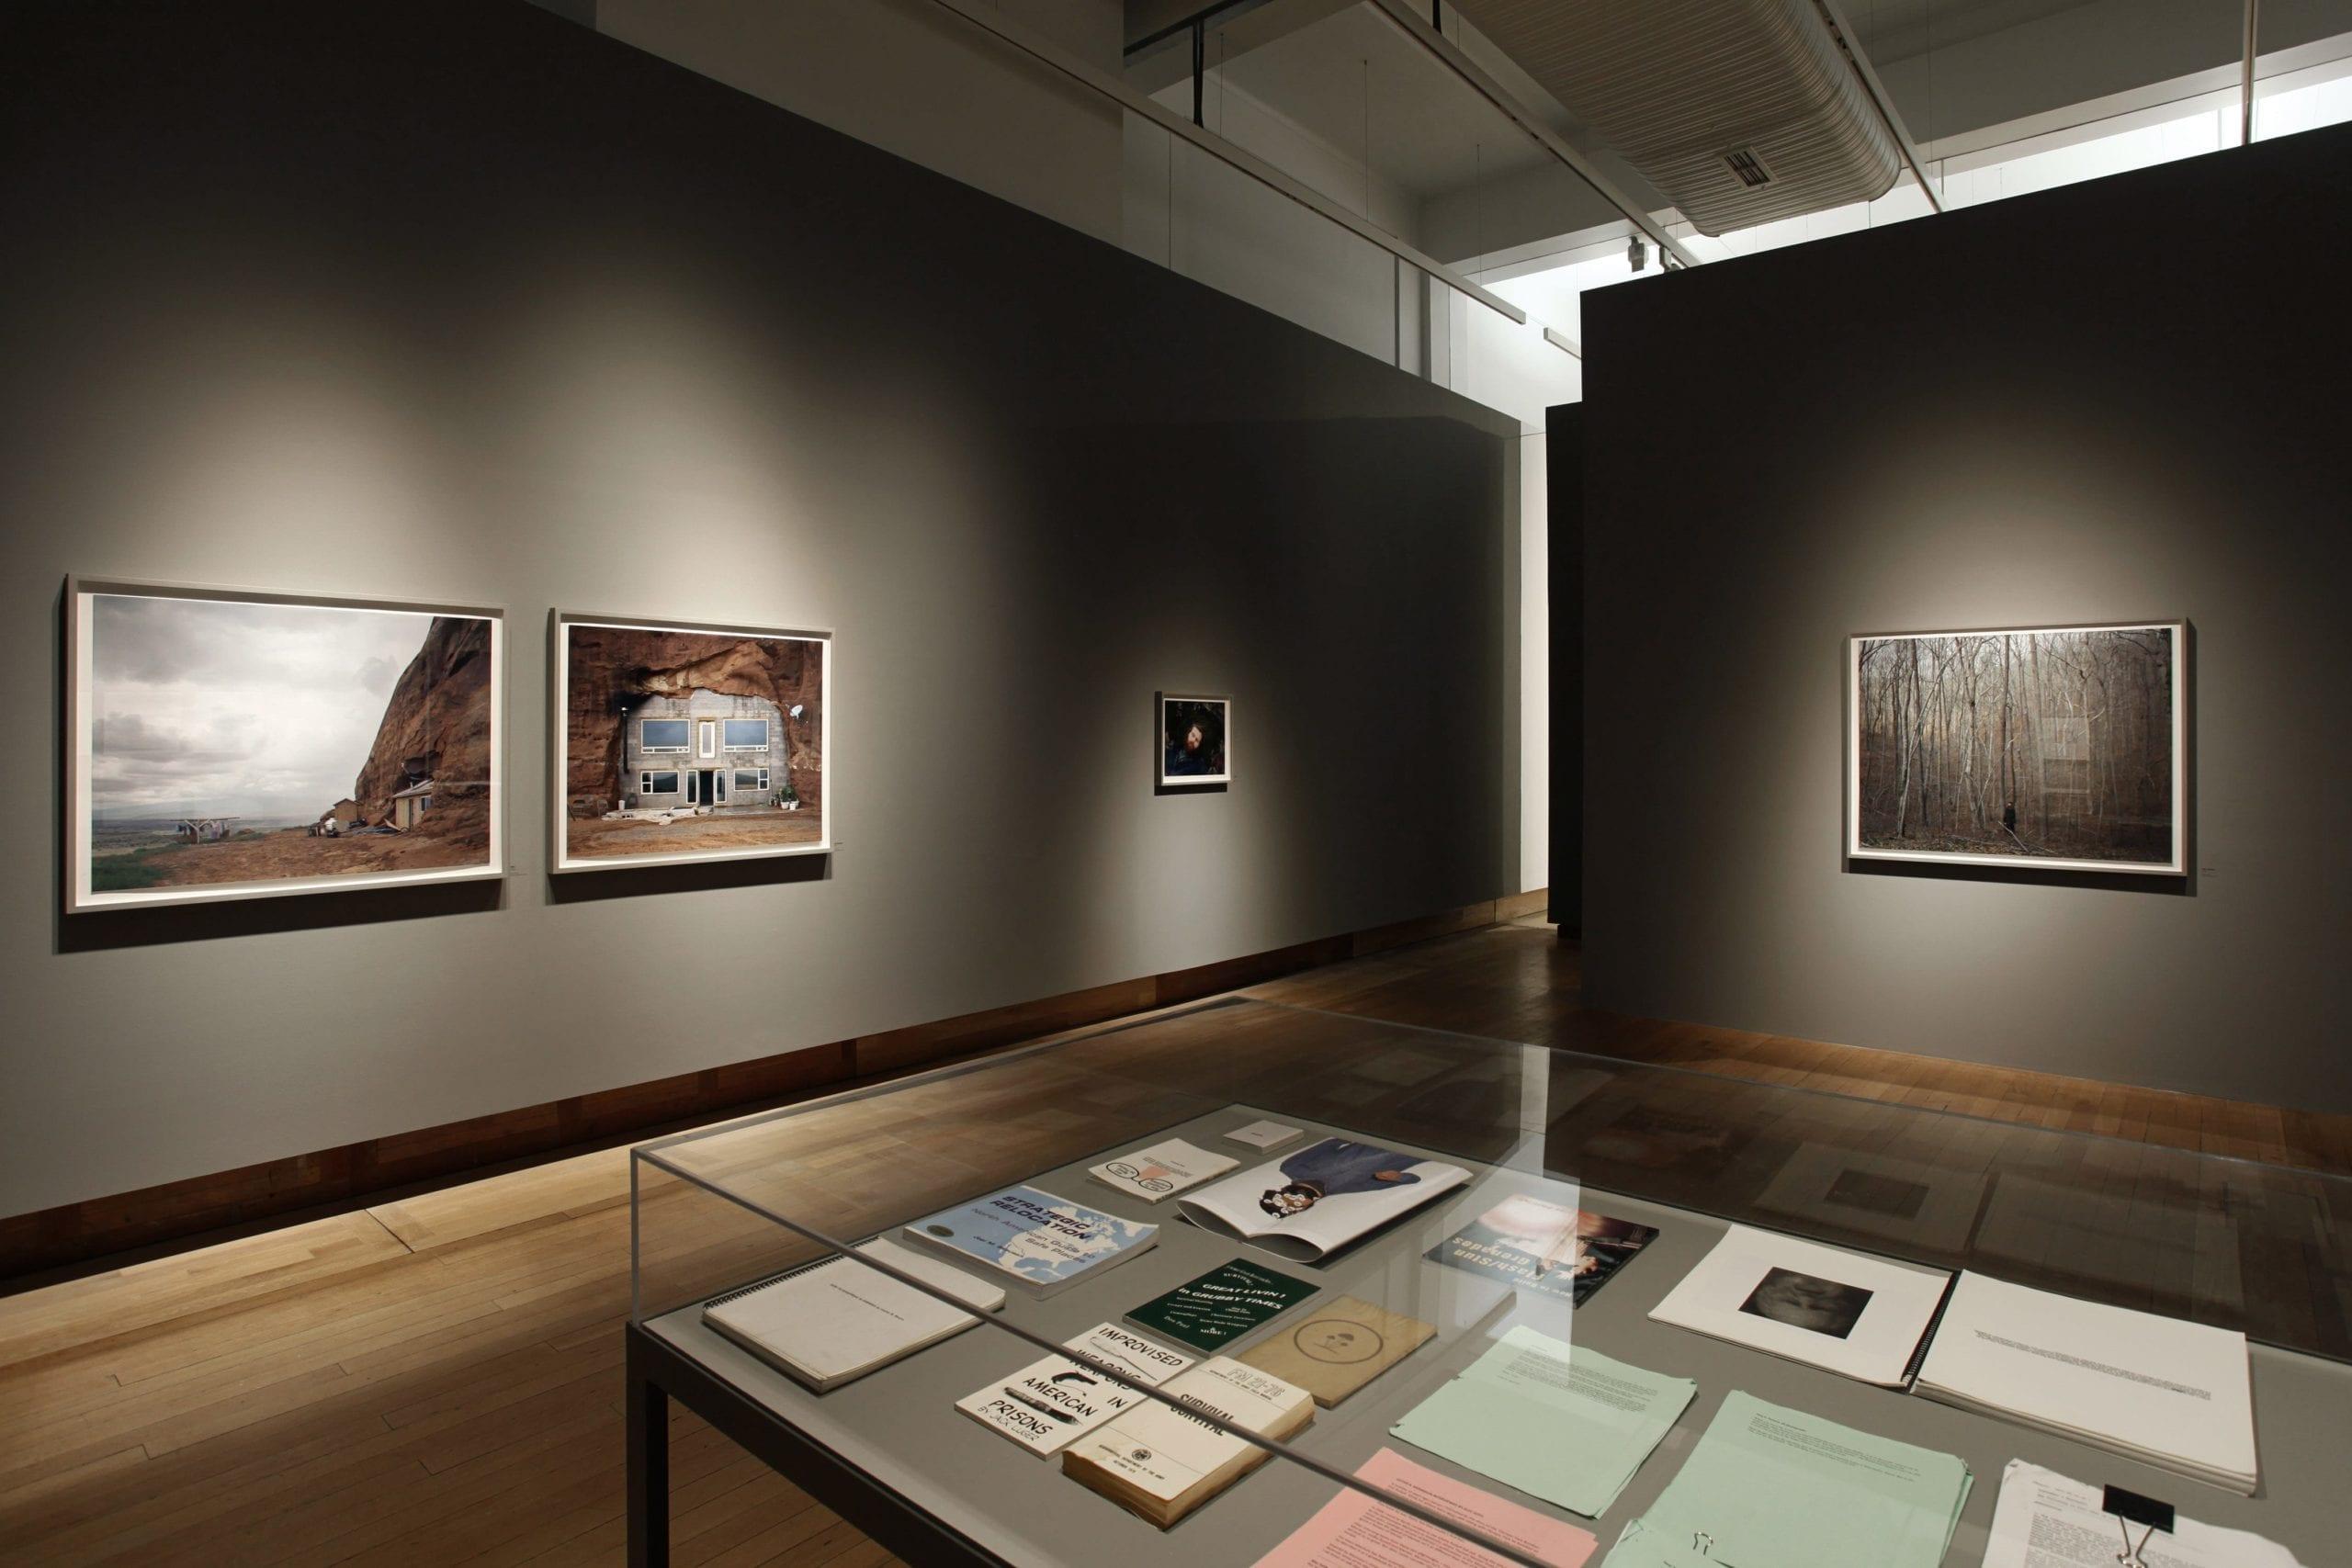 Alec Soth exhibition © Kate Elliott, courtesy Science Museum